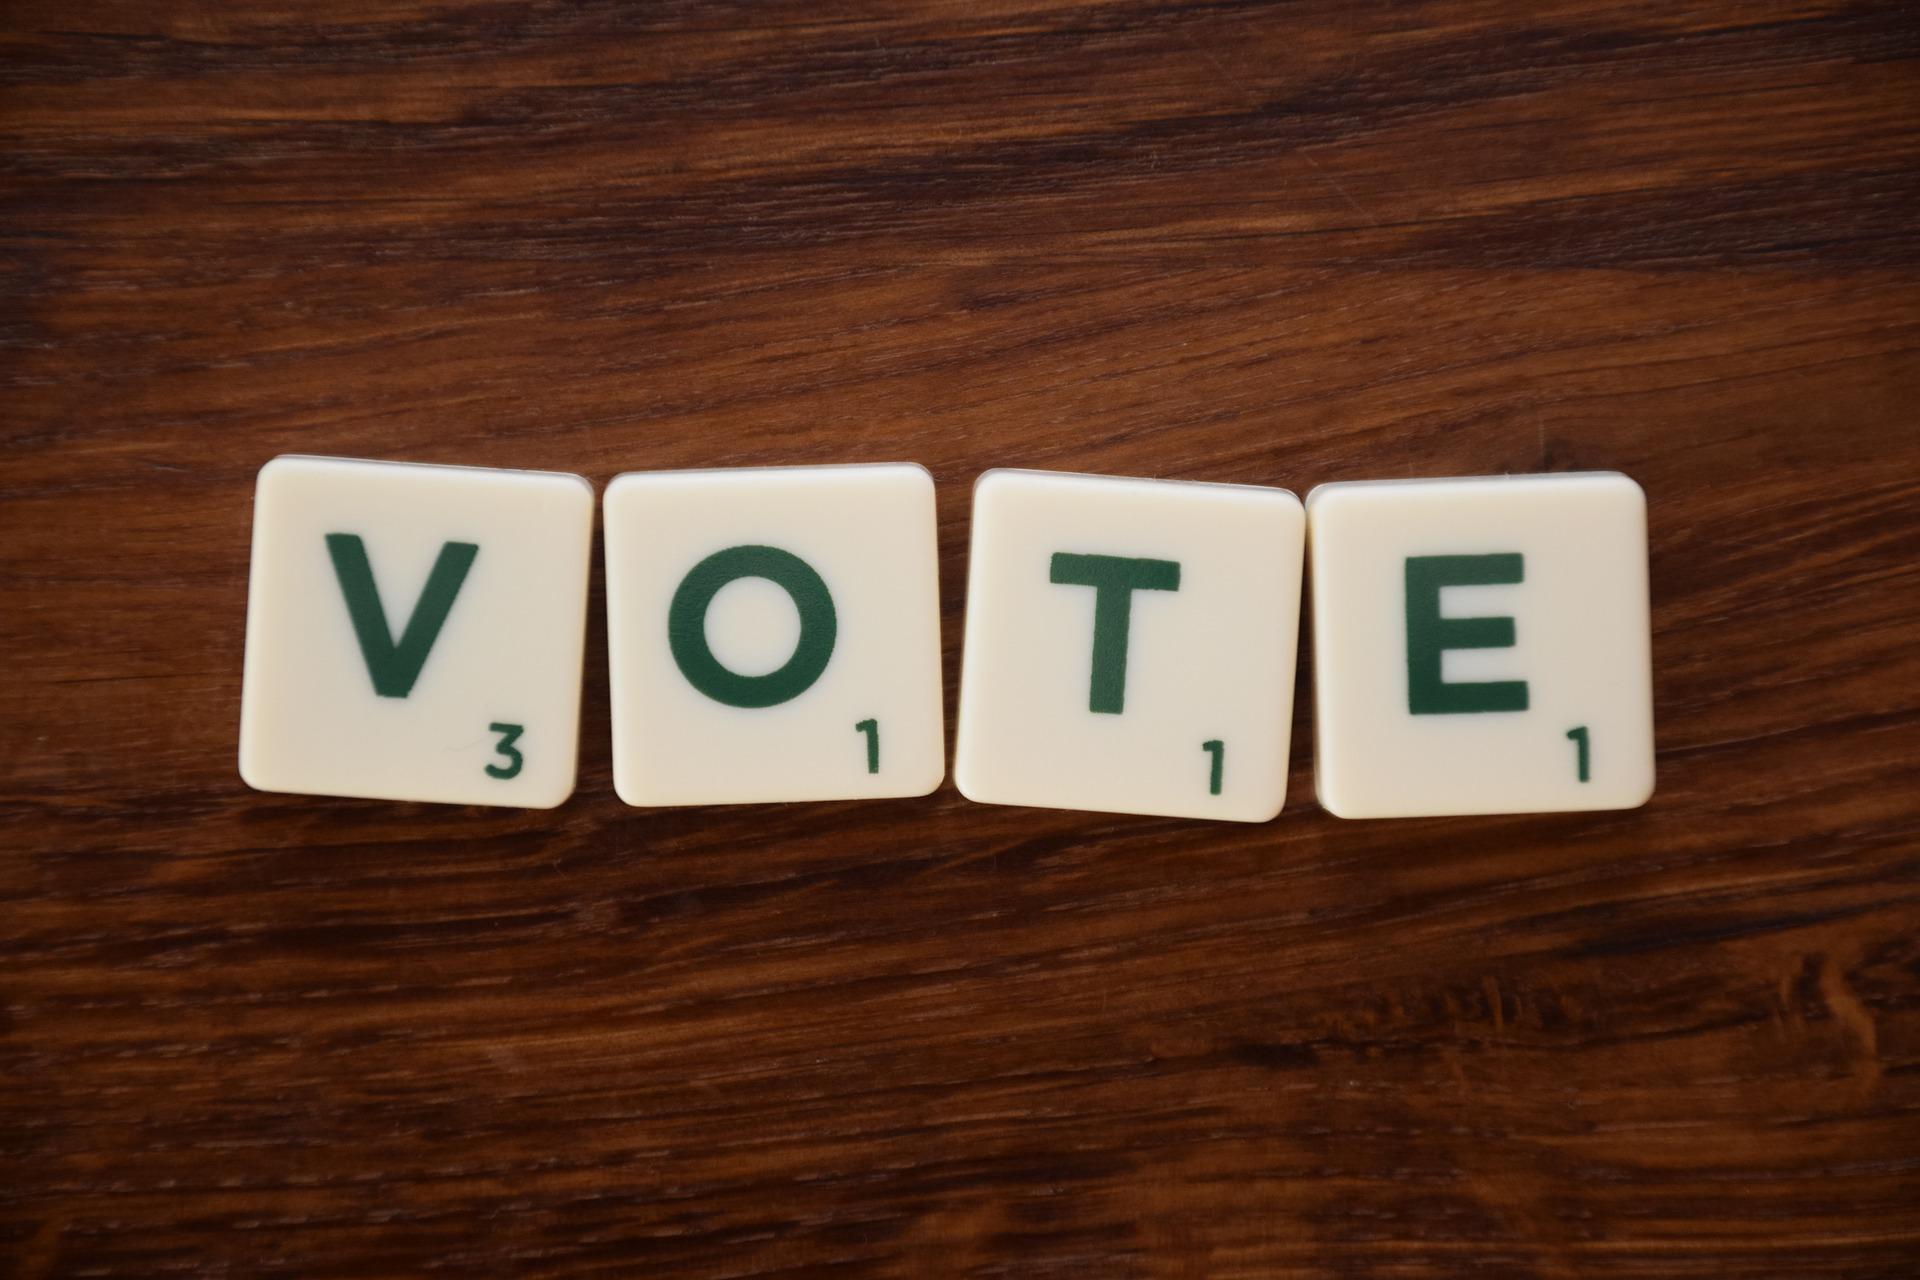 vote-3932253_1920